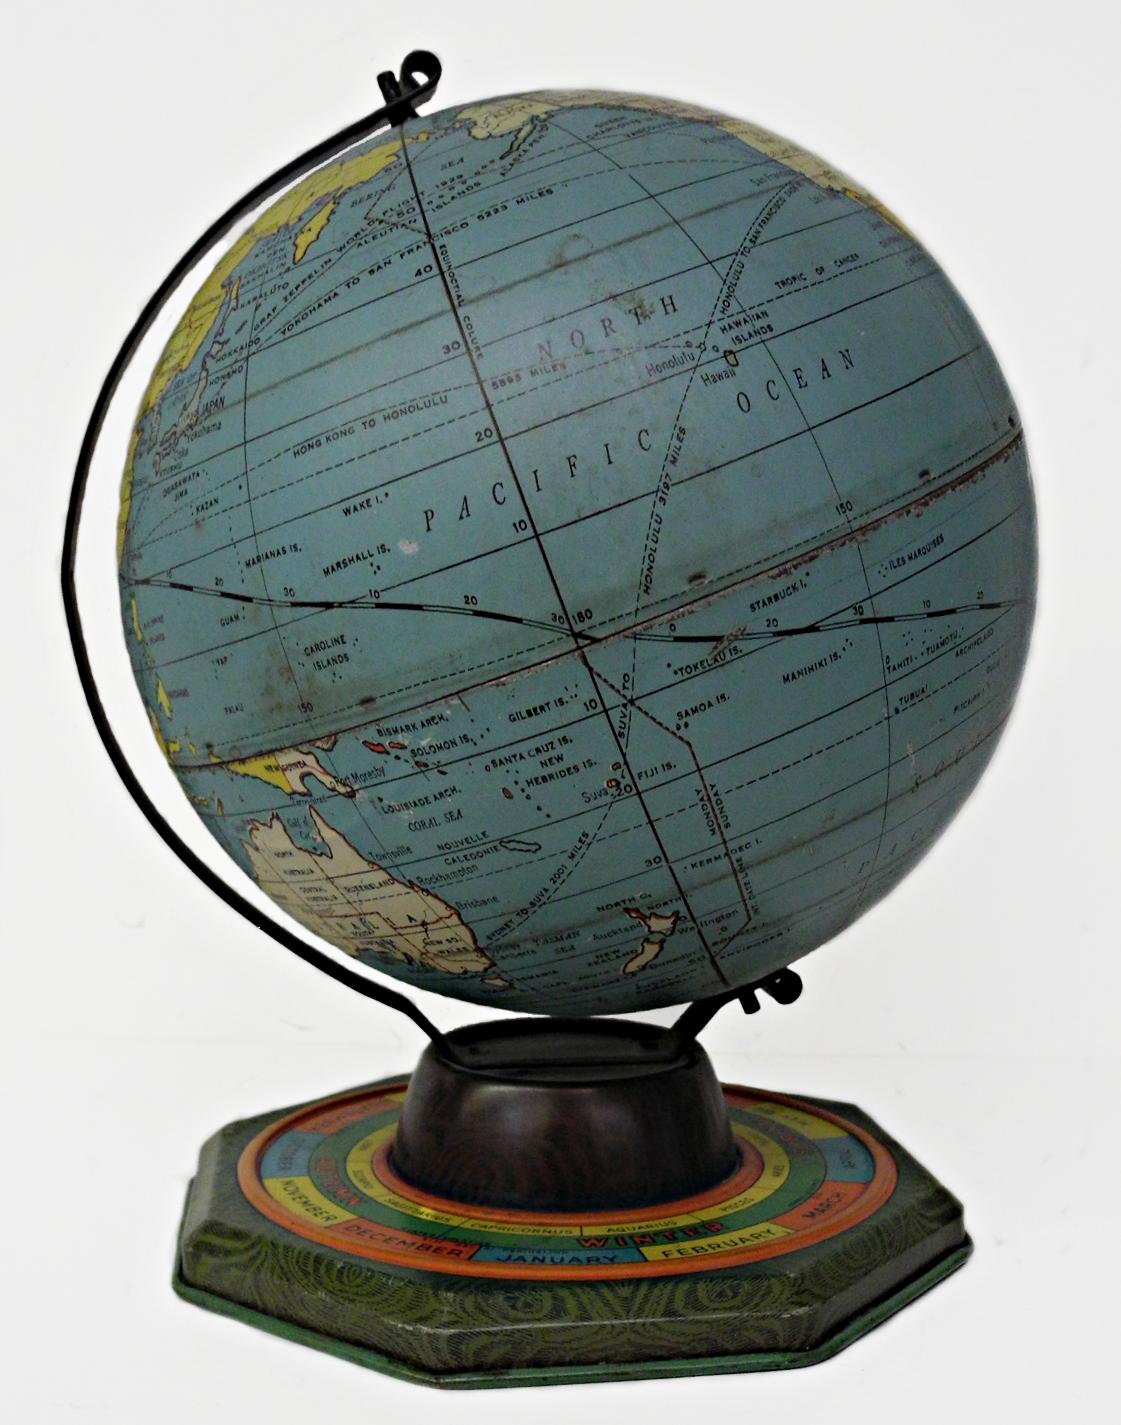 7 inch world globe globe maker j chein co published j chein 7 inch world globe globe maker j chein co published j chein co c1930 burlington nj publicscrutiny Image collections